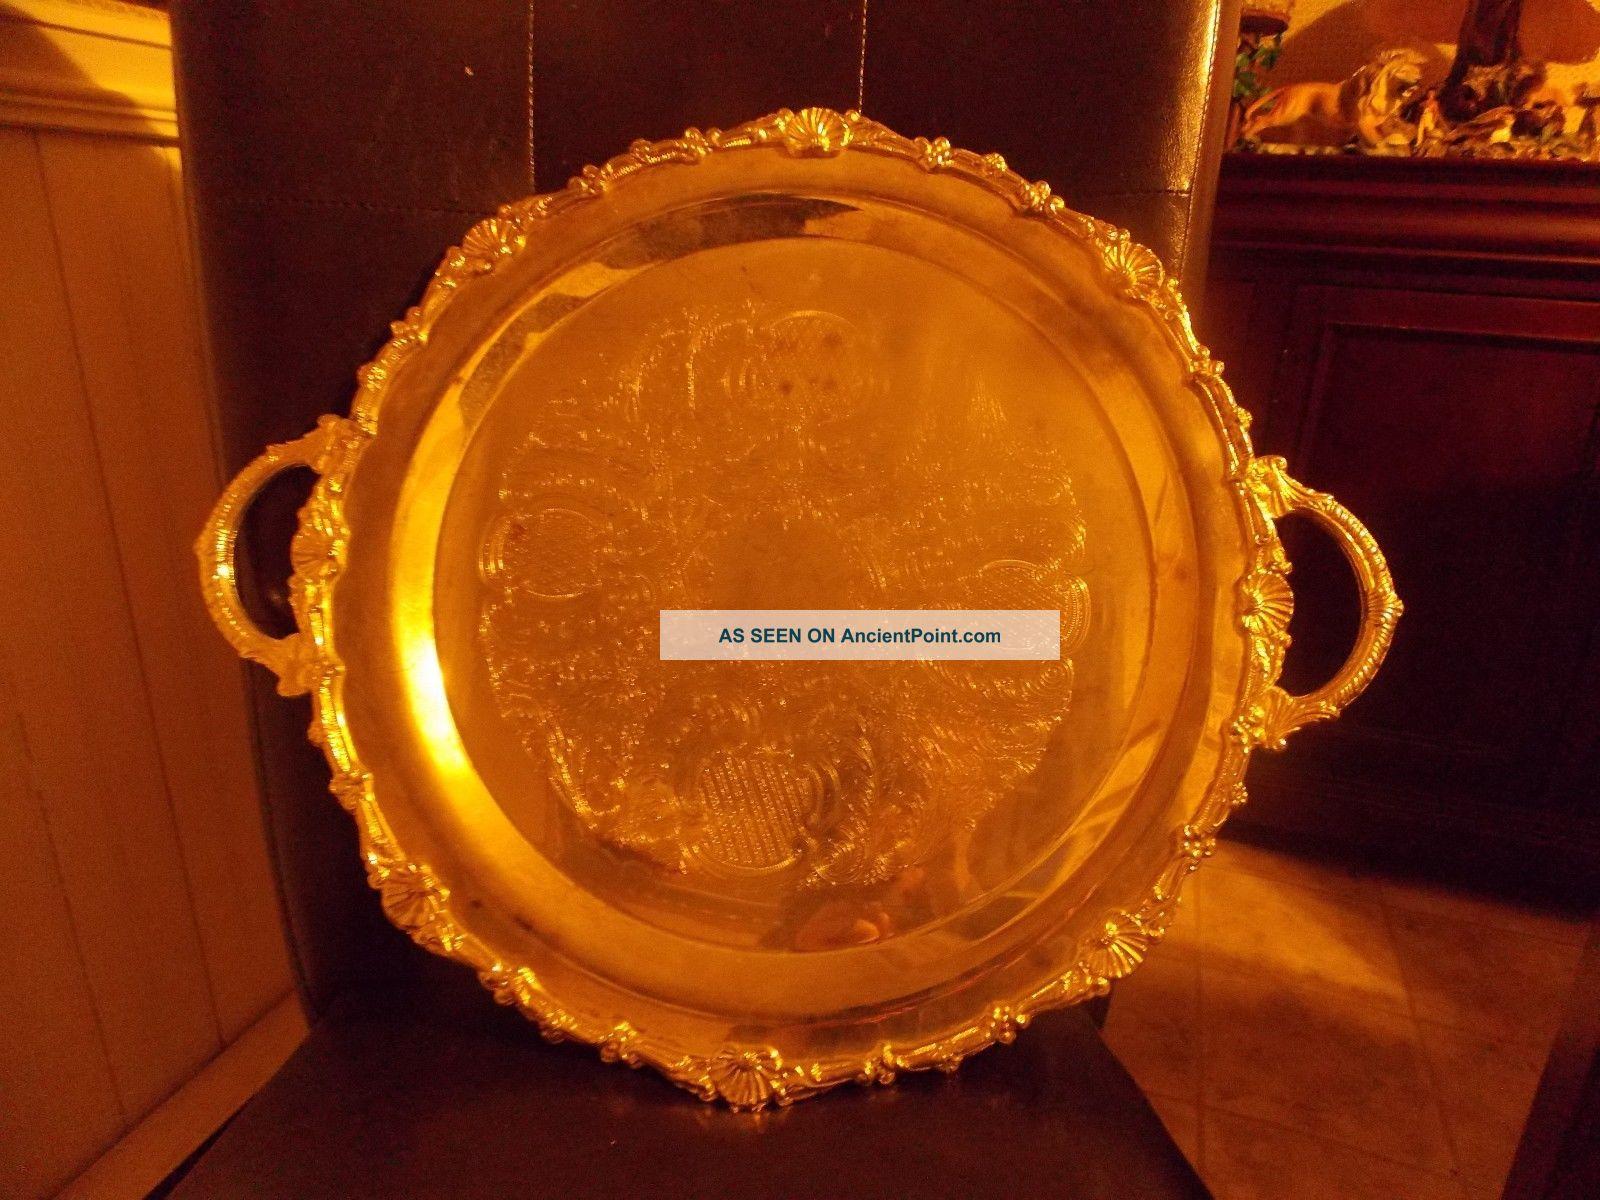 Vintage International Silver Co Handled Engraved Serving Tea Tray 17